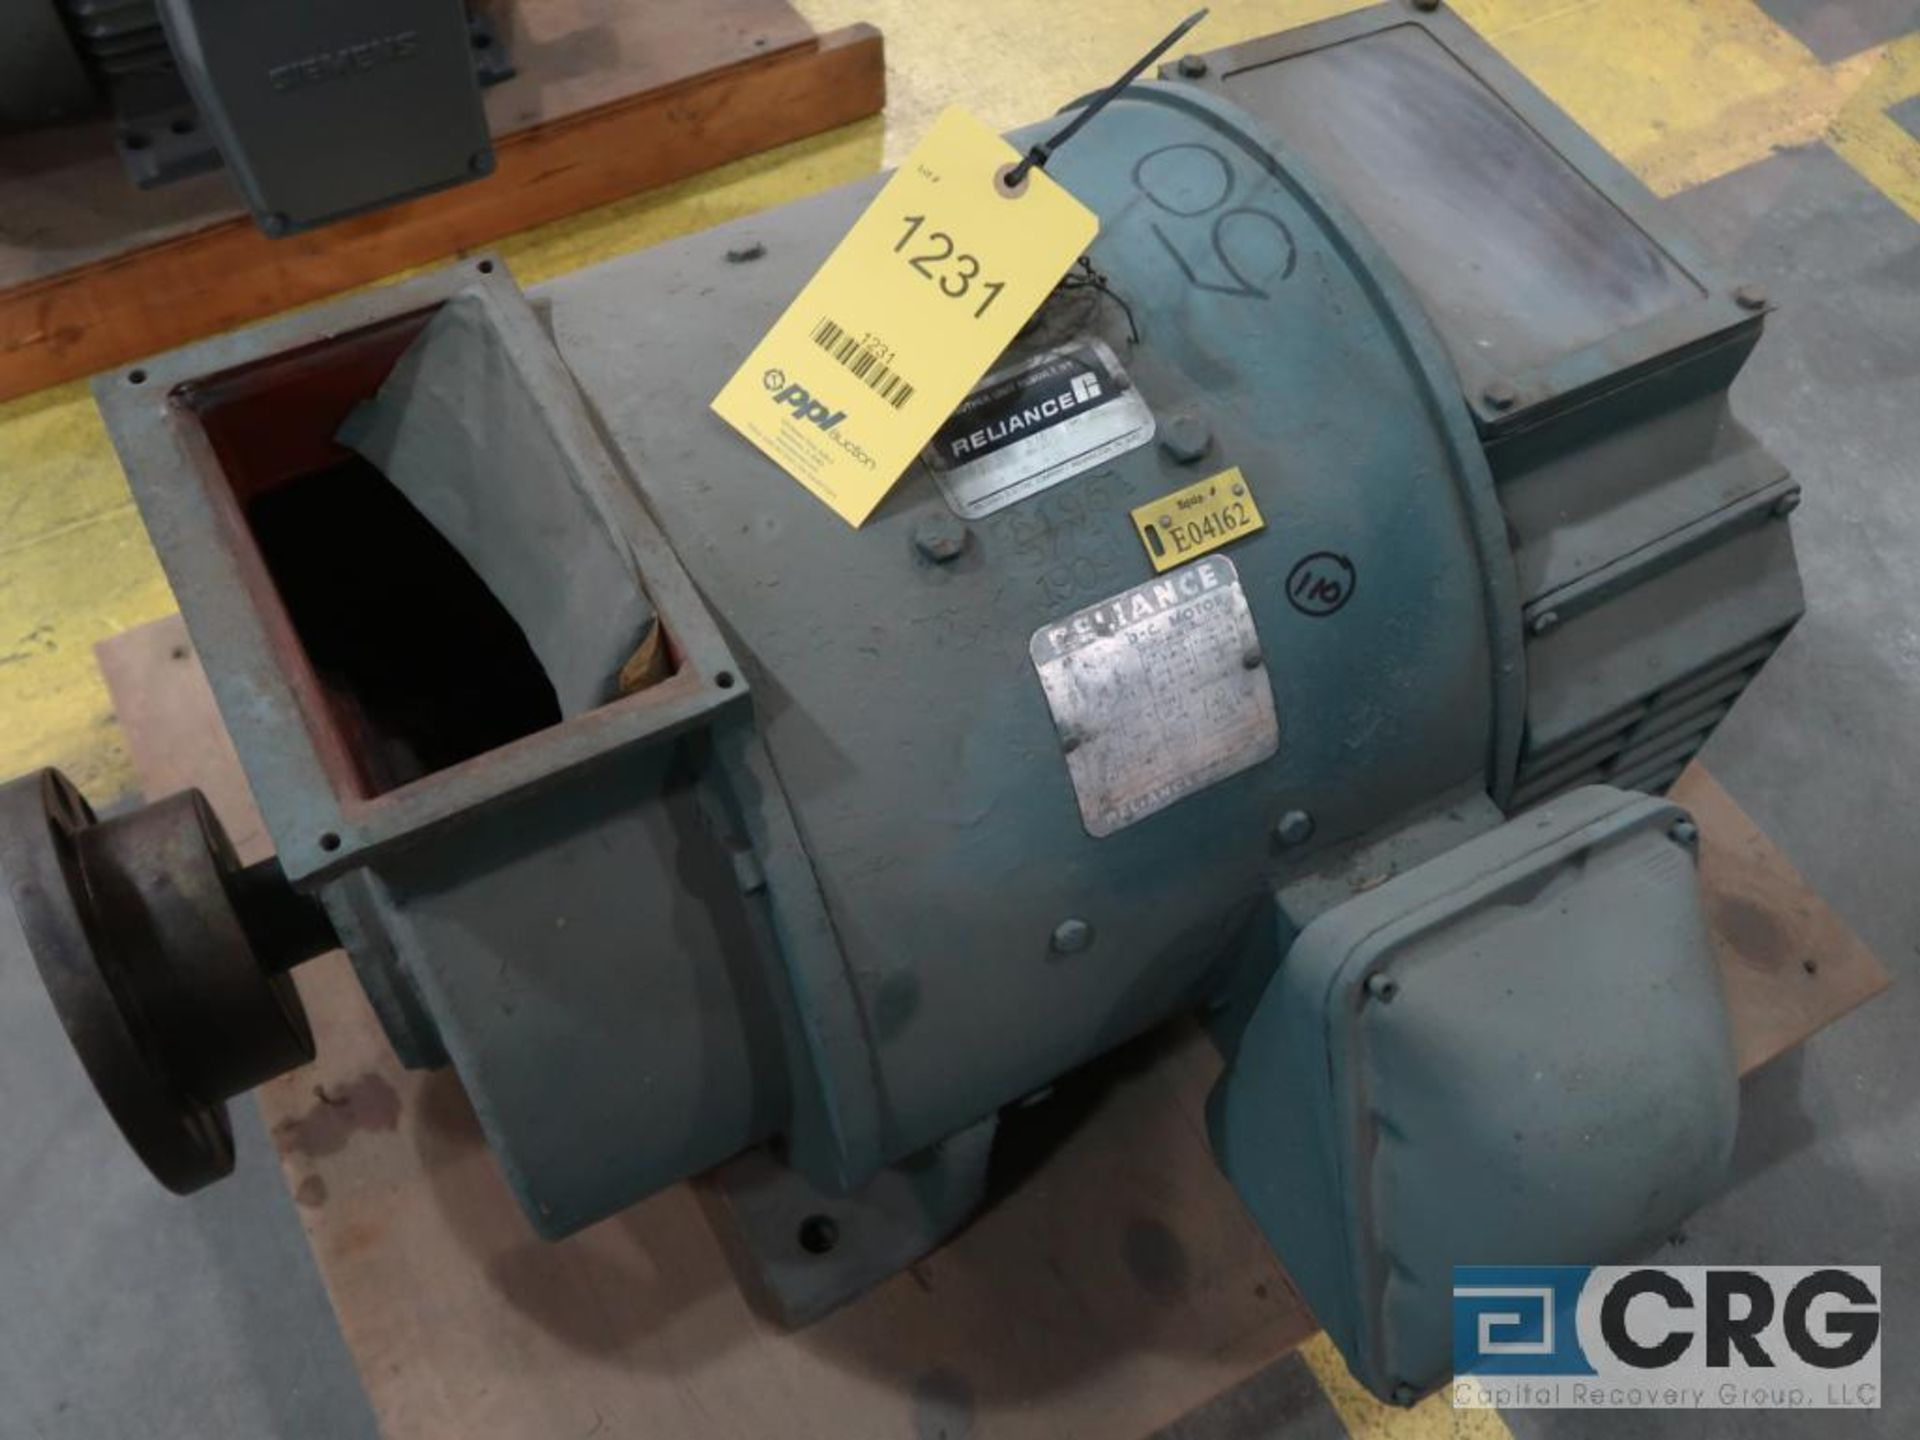 Reliance D-C motor, 50 HP, 1,750/2,000 RPMs, 240 volt, 3 ph., 405A-S frame (Finish Building)